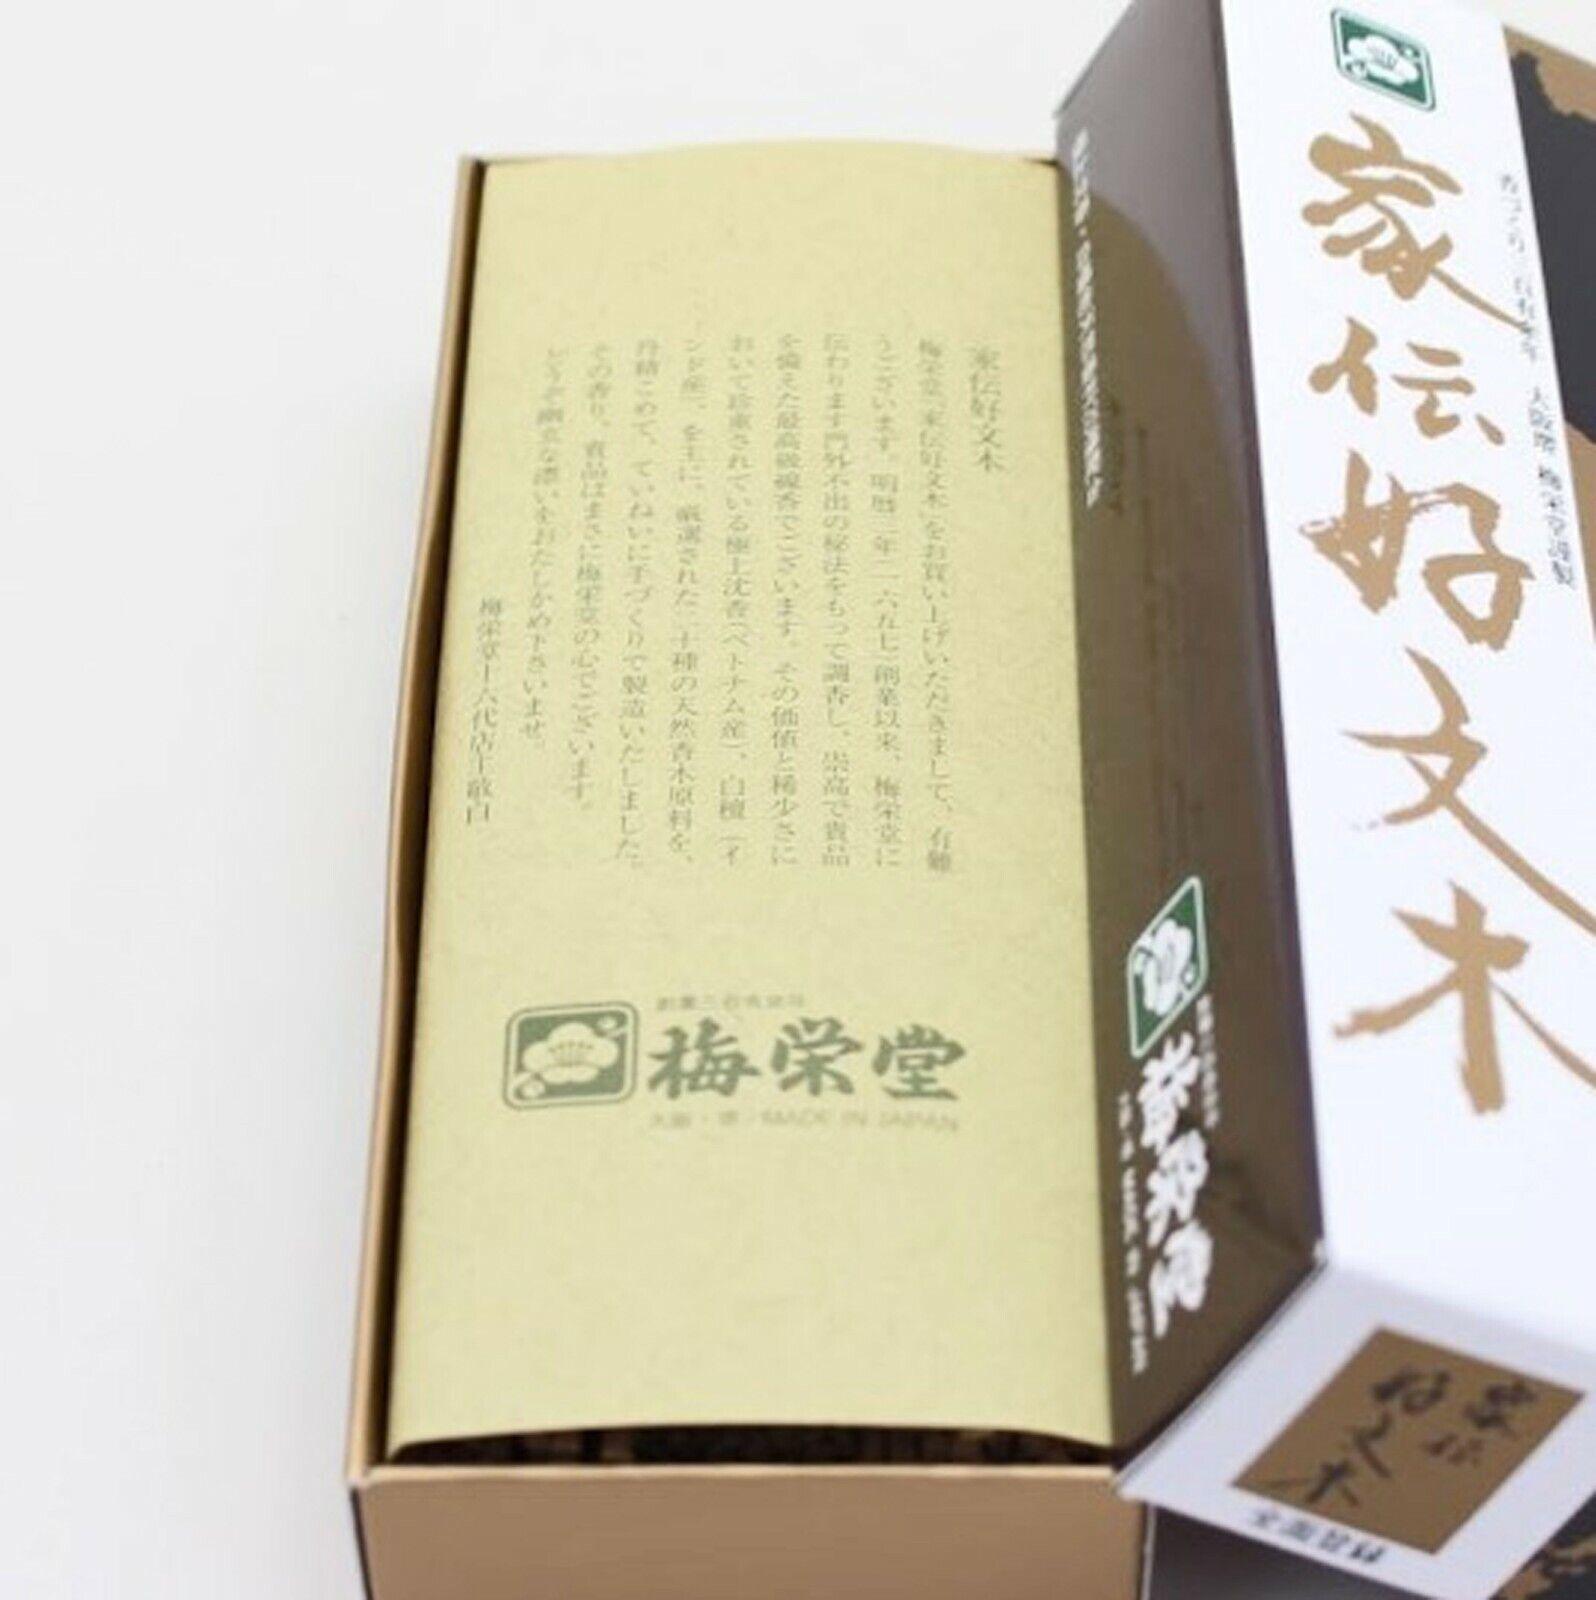 Details about  /Japanese Jinkou Agarwood Sandalwood Incense Kaden Koubunboku Baieido 230 Sticks